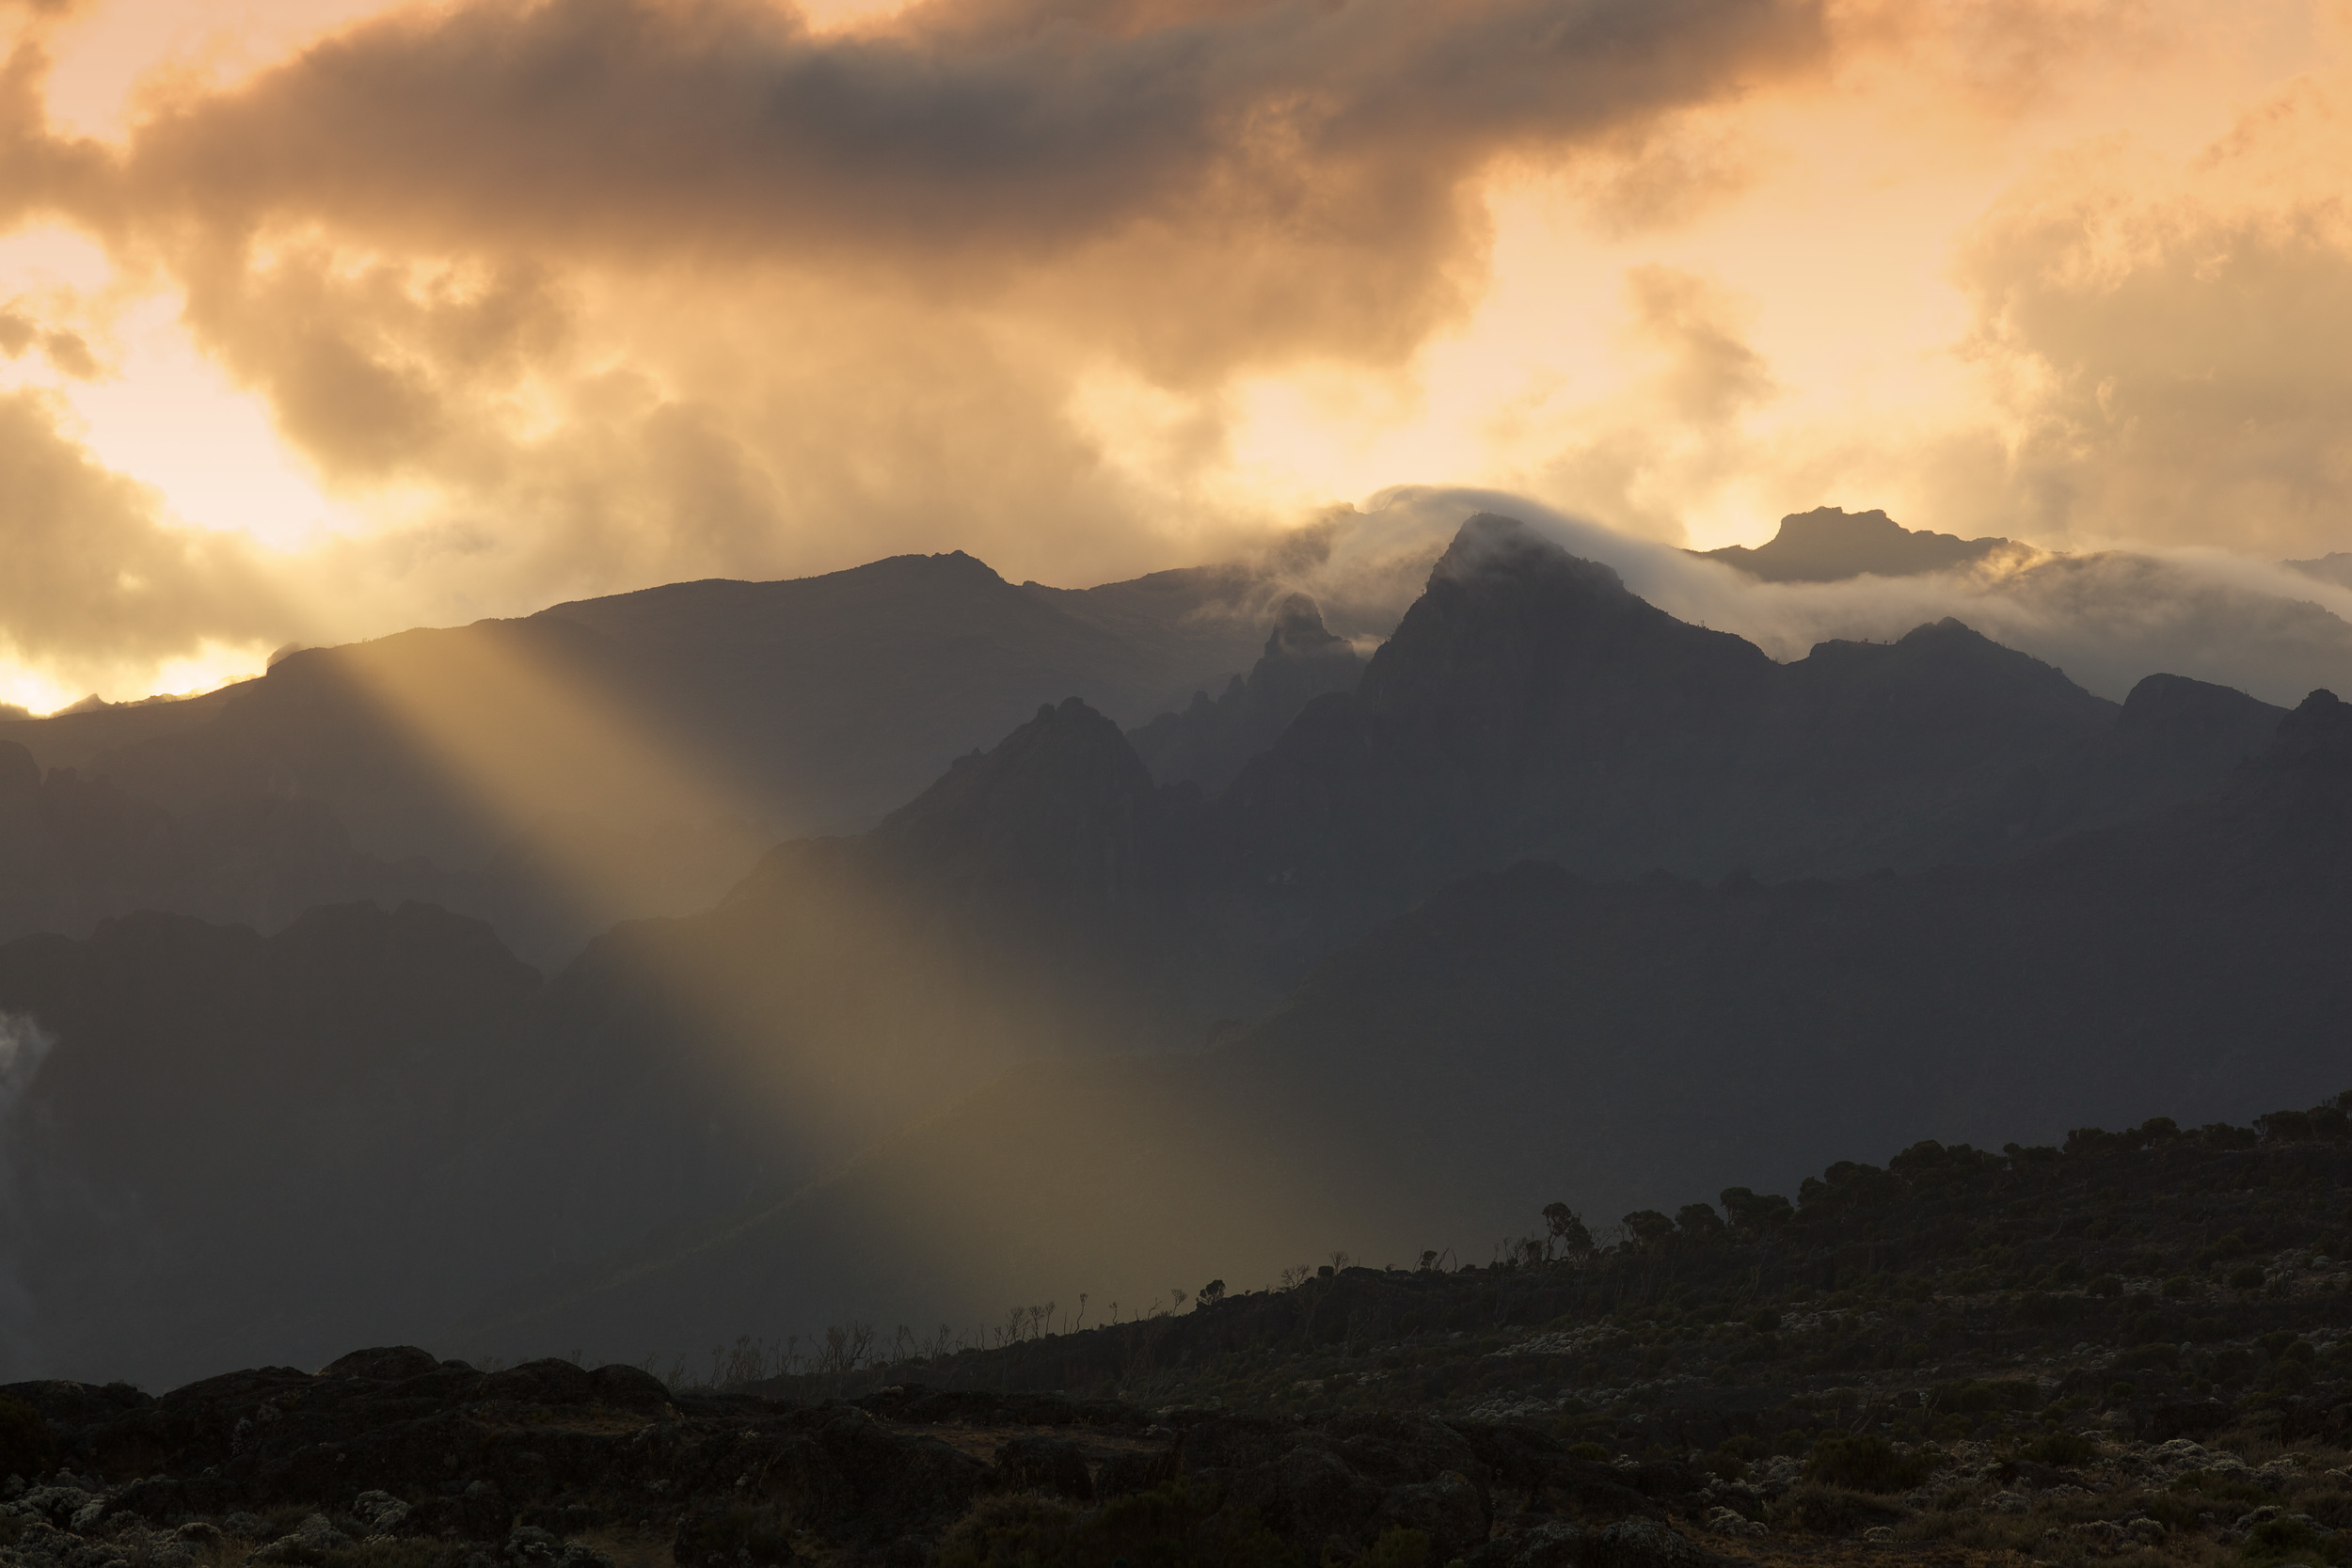 Magic Light, Shira Camp, 3940 asml, Kilimanjaro (TZ), Sep 2012